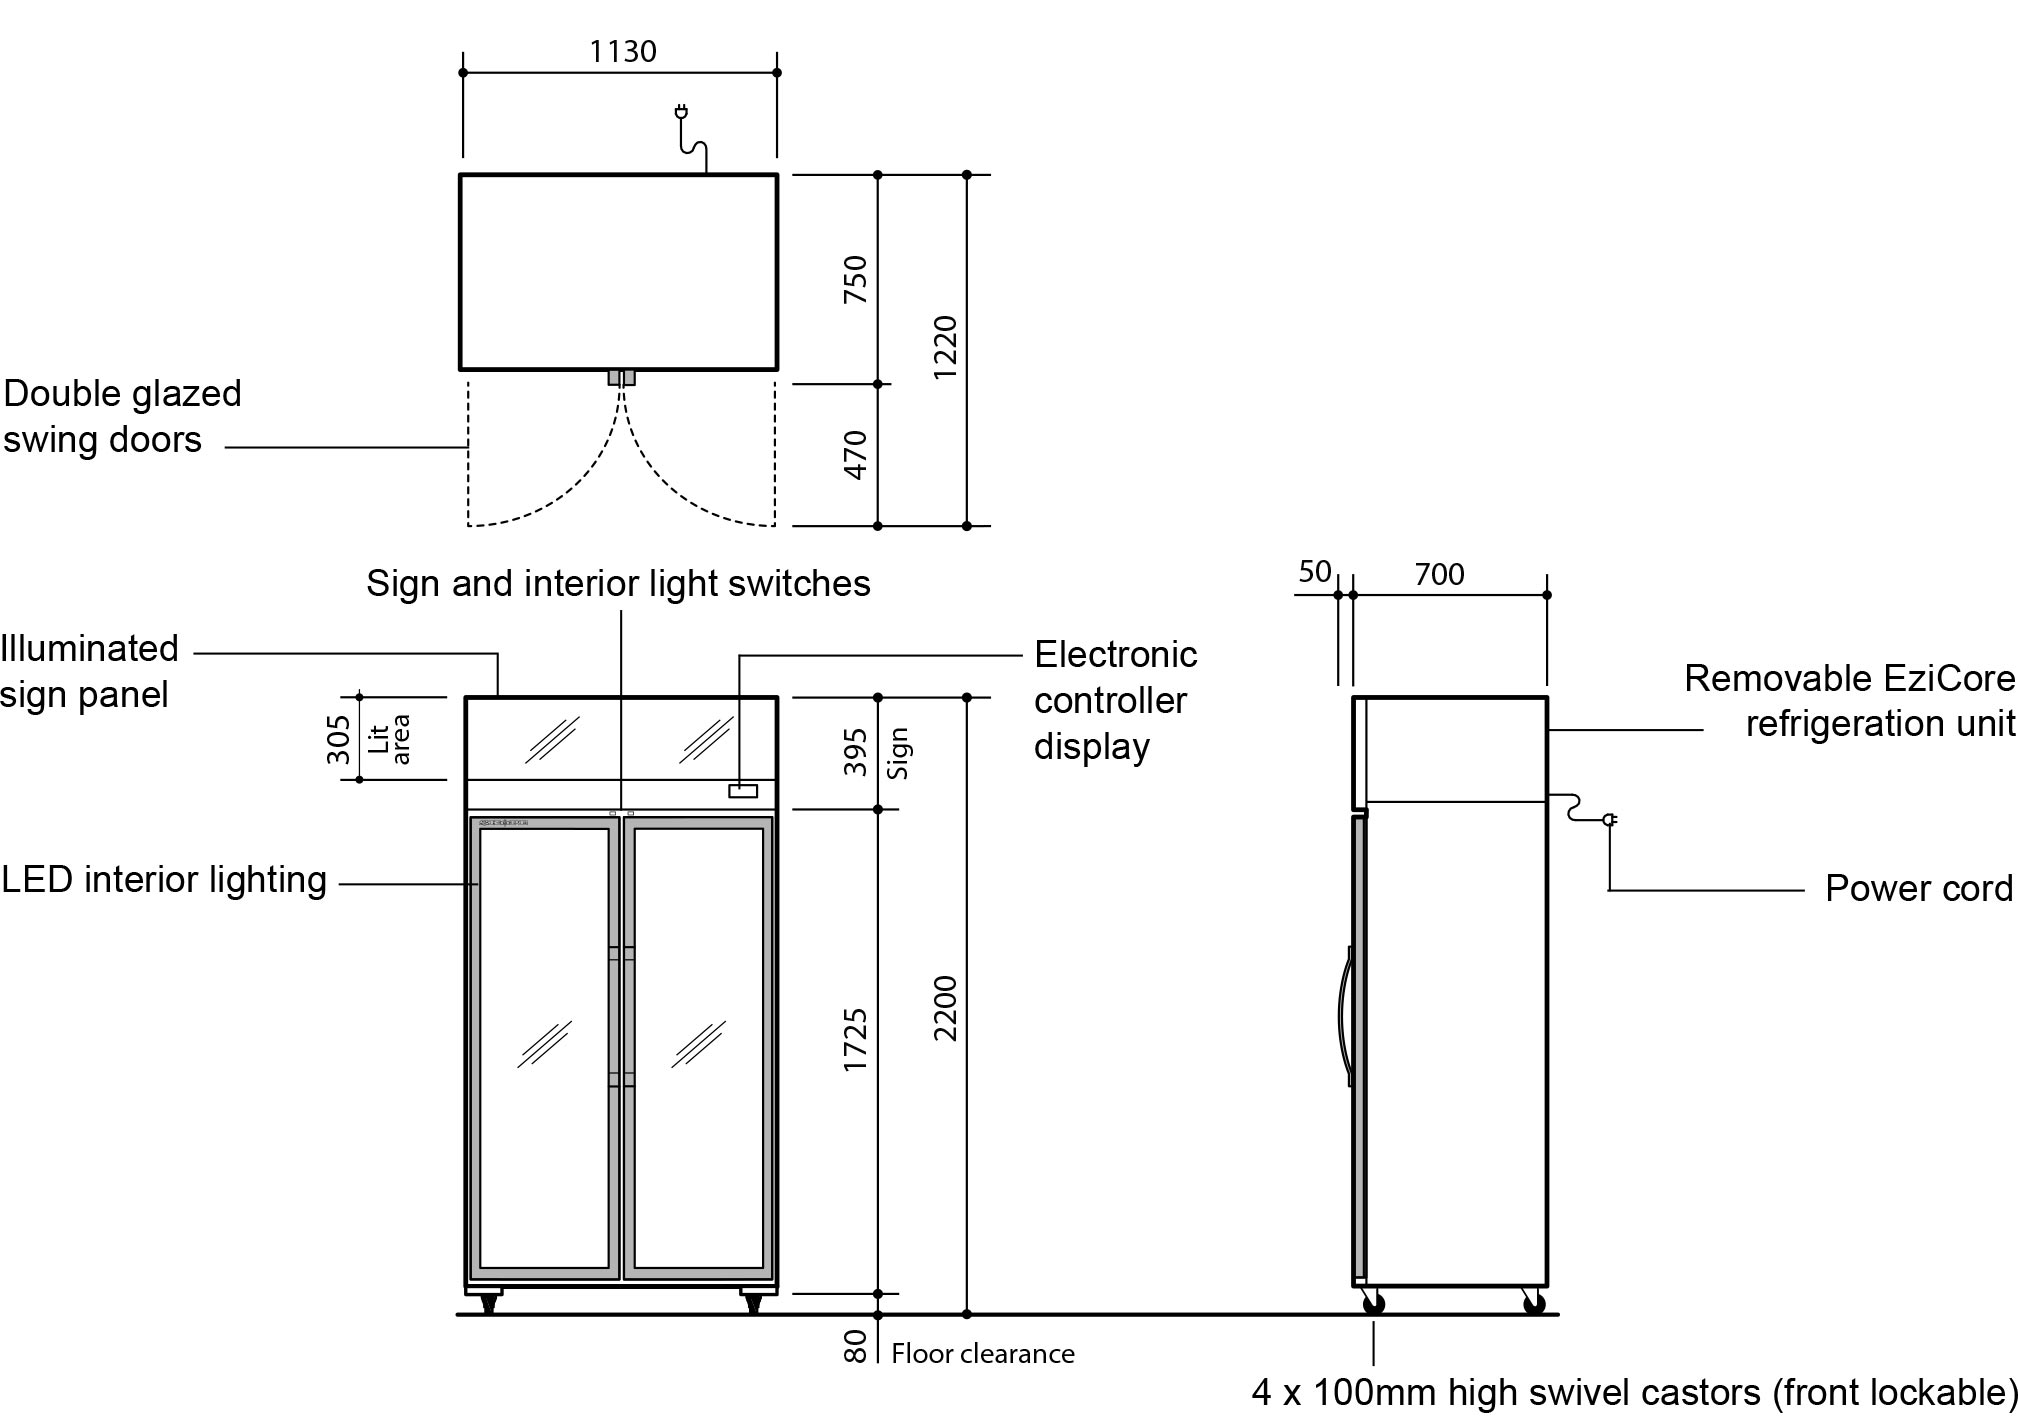 Skope TCE1000 Fridge Upright Integral White 2 Glass Doors